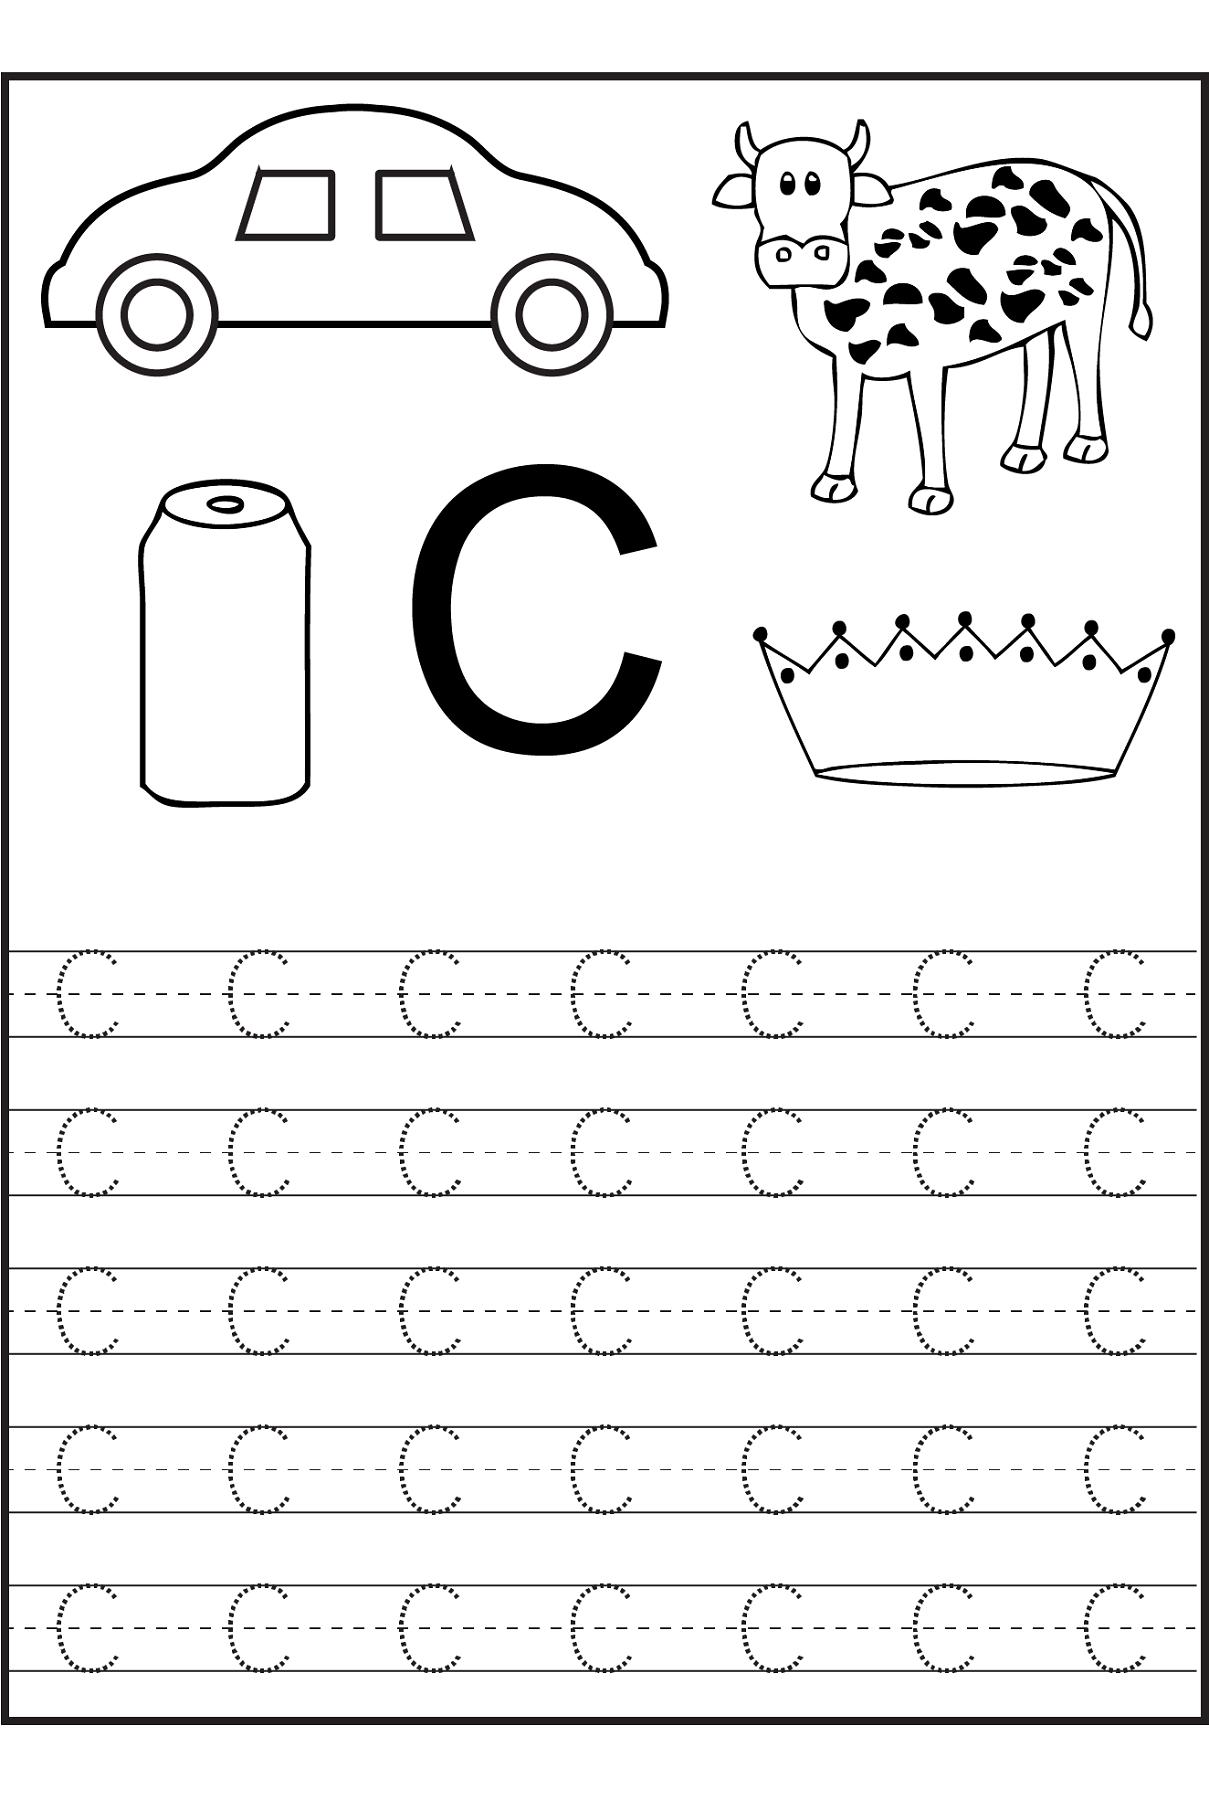 Trace The Letter C Worksheets | Free Preschool Worksheets